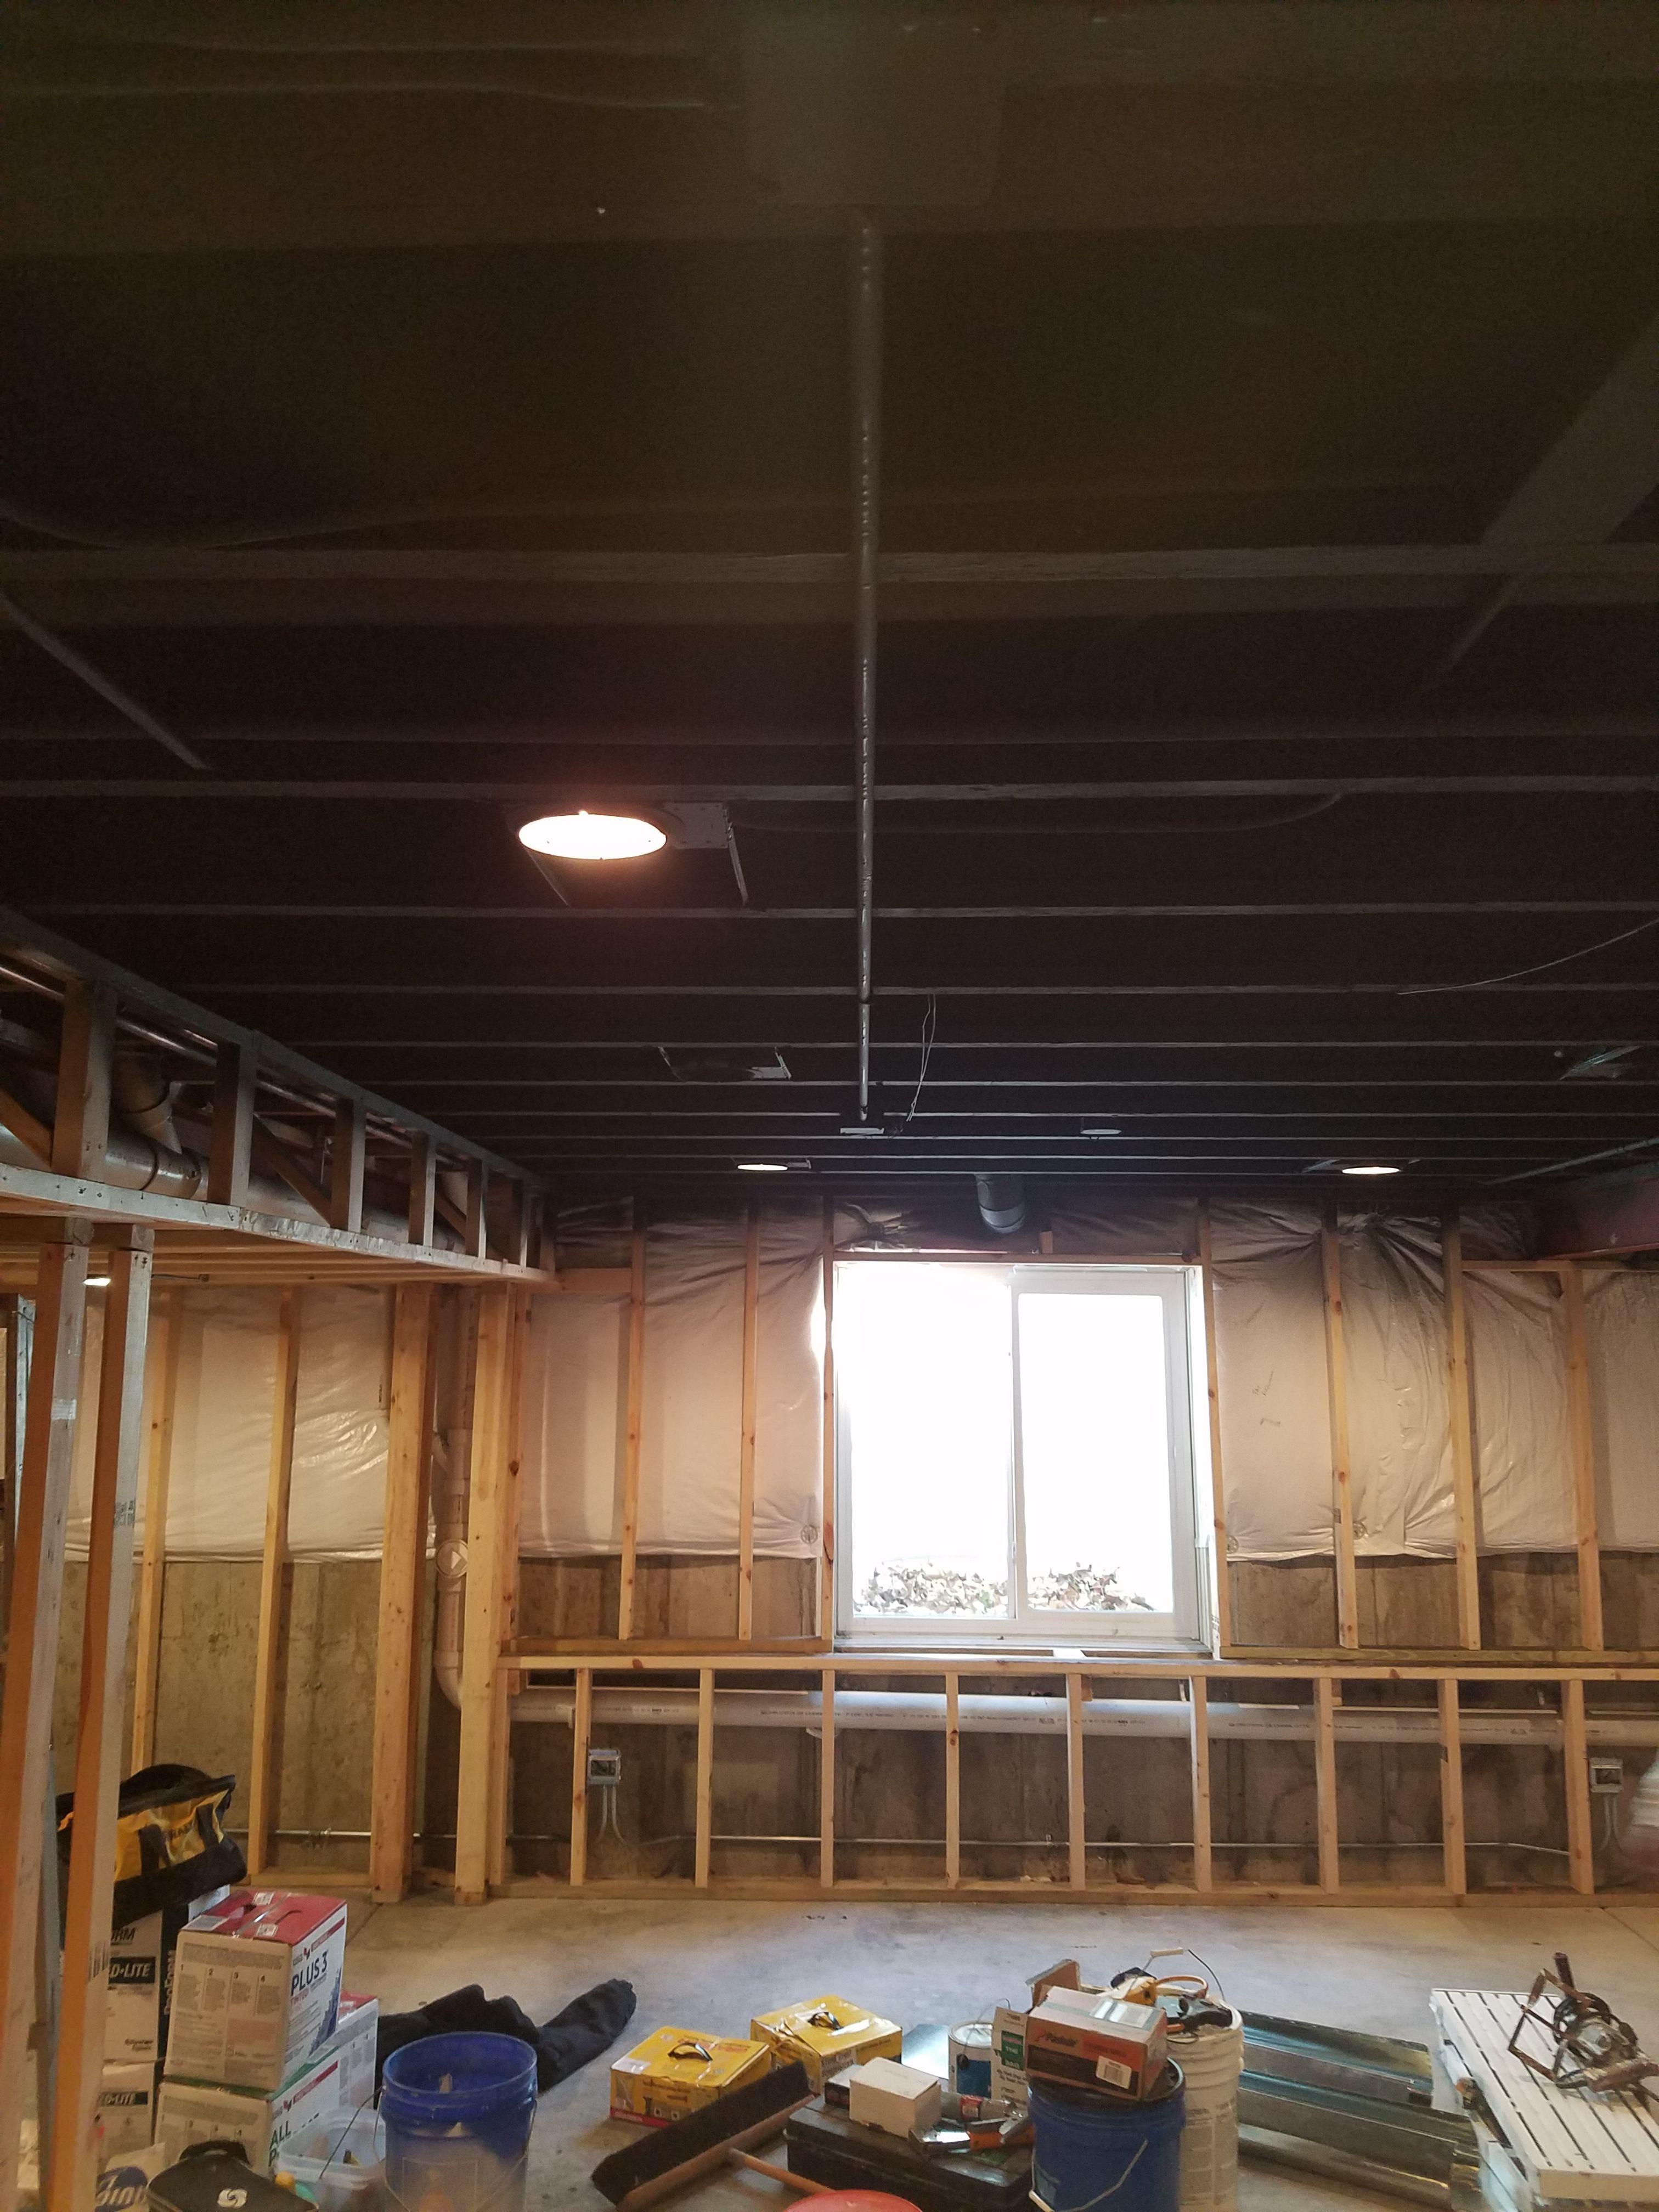 Basement Ceiling Painted Black Before Drywall Basement Ceiling Painted Finishing Basement Low Ceiling Basement